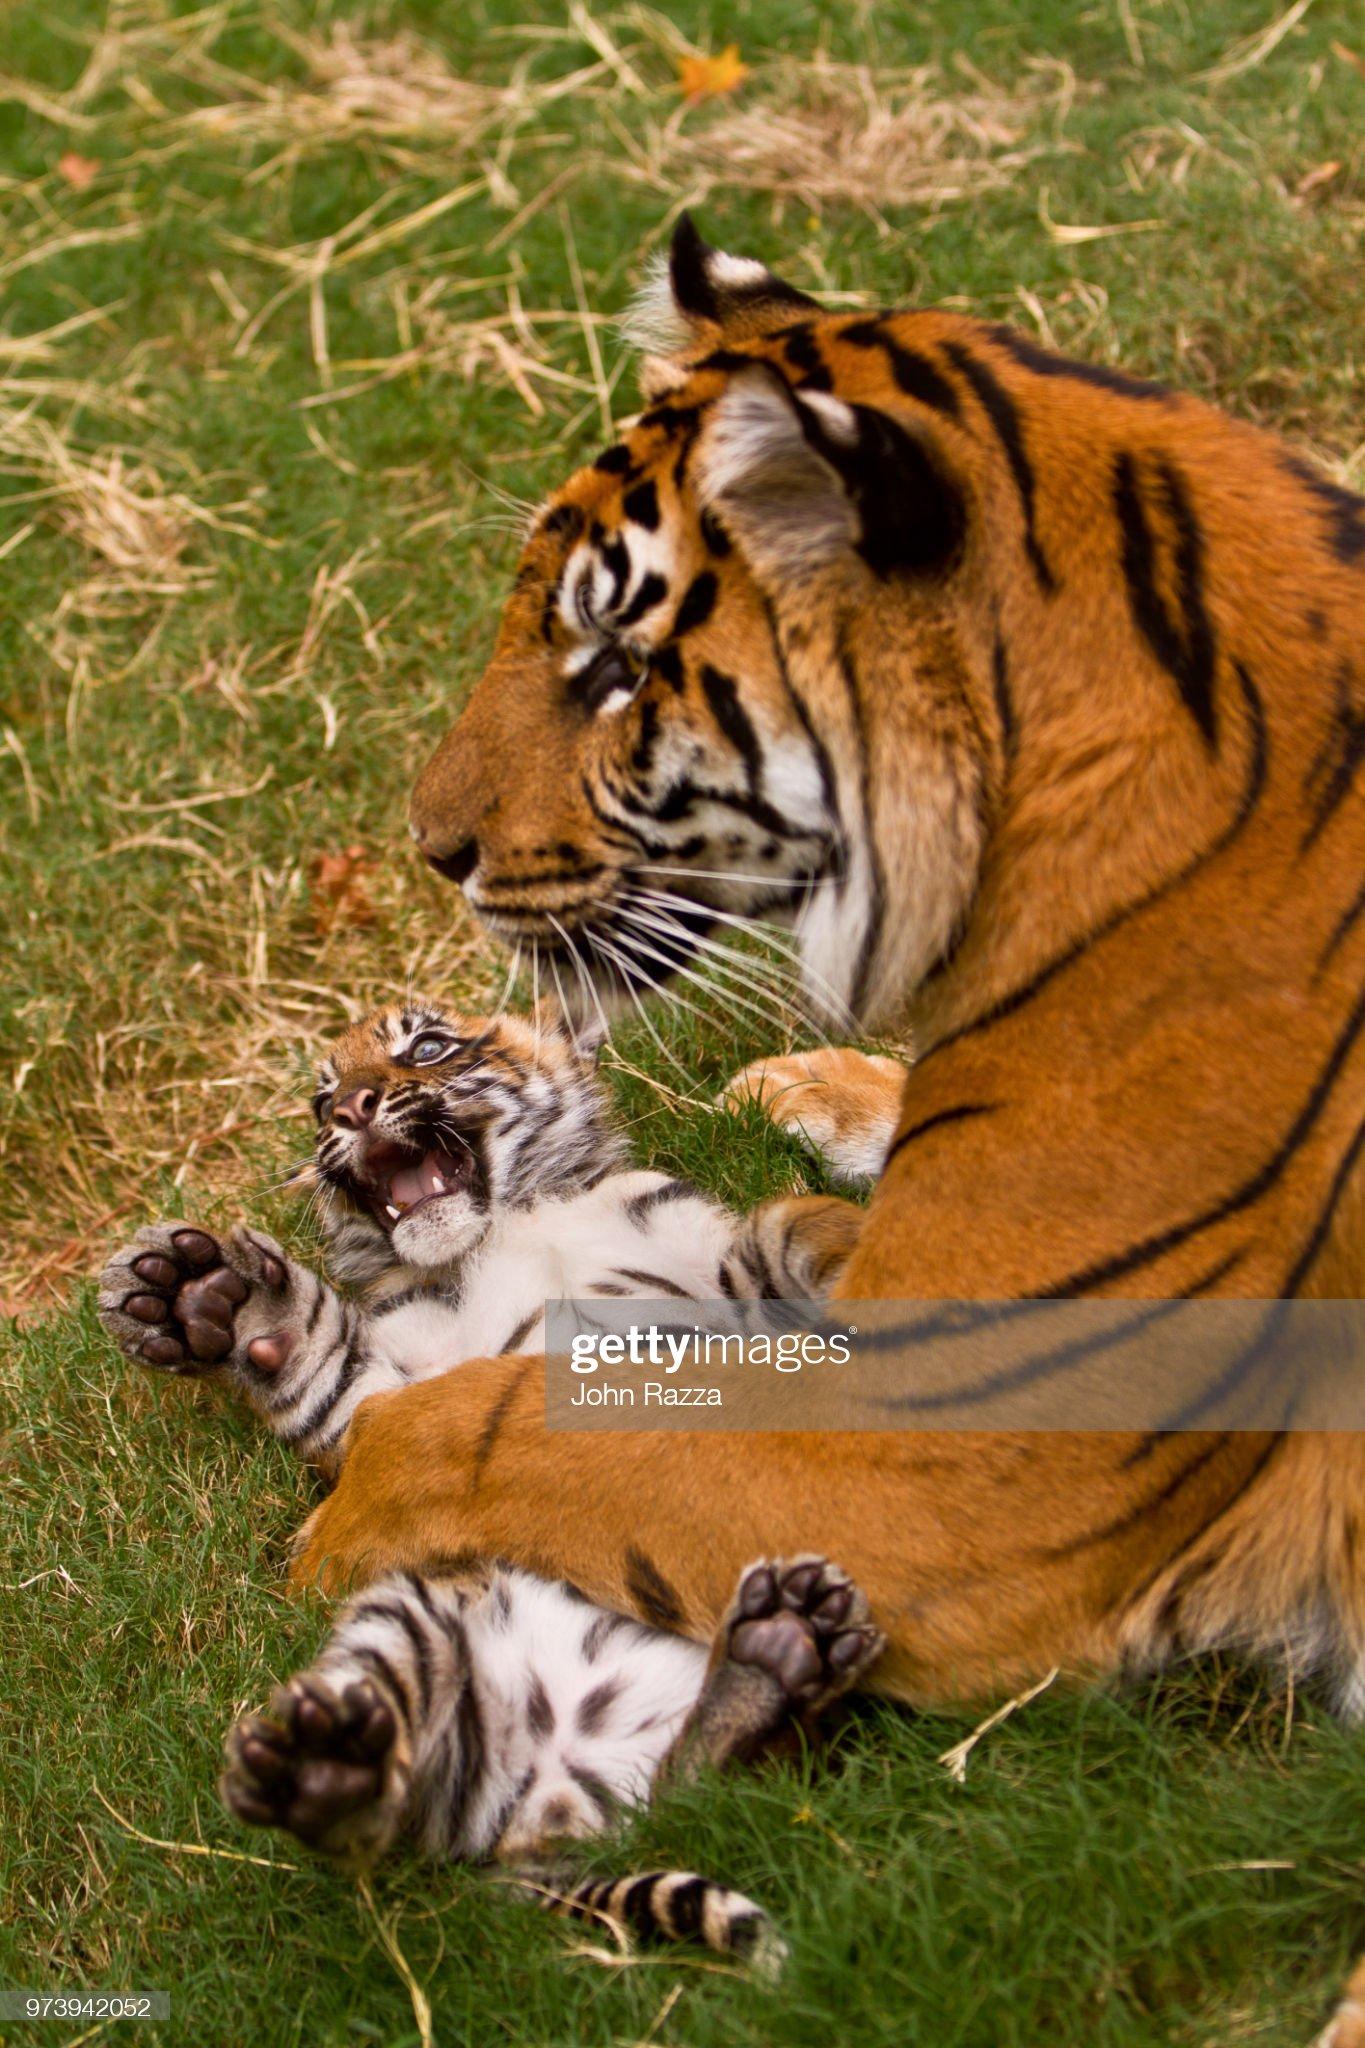 Female tiger (Panthera tigris) holding cub : Stock Photo